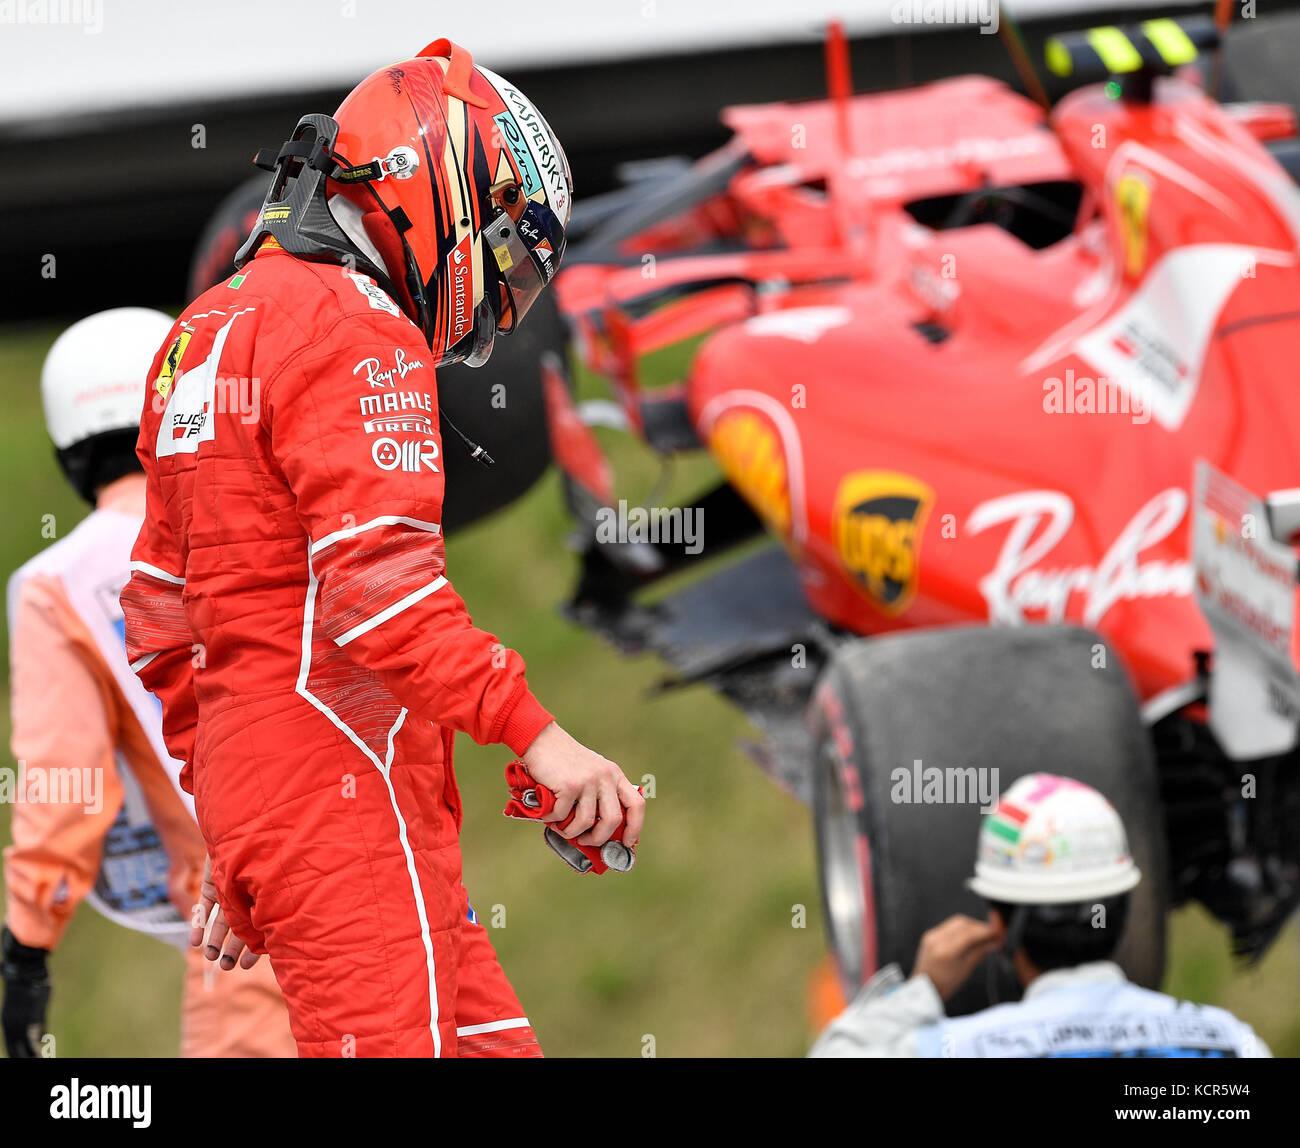 Suzuka, Japan. 7th Oct, 2017. 2017 FORMULA 1 JAPANESE GRAND PRIX , 06. - 08.10.2017 Accident/crash of Kimi Raikkonen Stock Photo